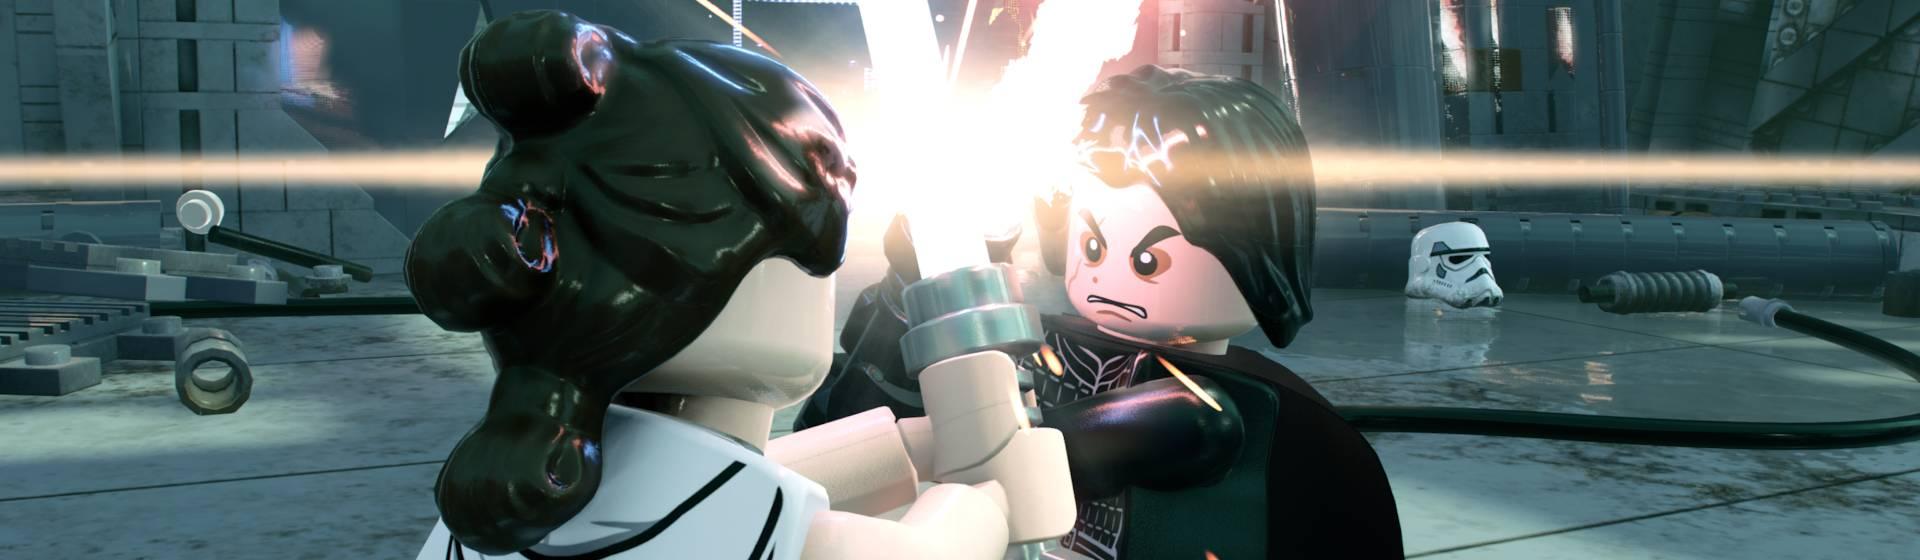 LEGO Star Wars: The Skywalker Saga - data de lançamento e novidades